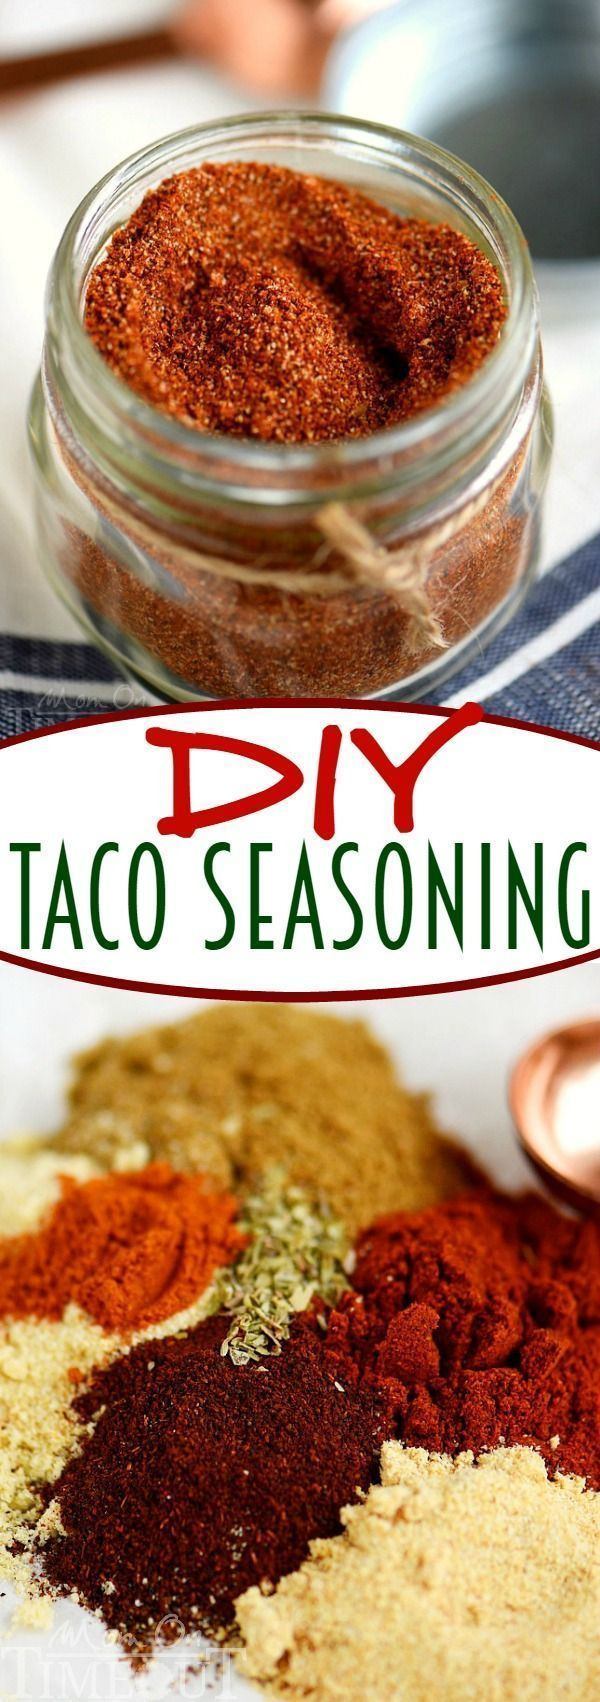 DIY Taco Seasoning #diytacoseasoning The recipe everyone needs in their dinner arsenal - DIY Taco Seasoning! Makes a great gift too! | eBay #diytacoseasoning DIY Taco Seasoning #diytacoseasoning The recipe everyone needs in their dinner arsenal - DIY Taco Seasoning! Makes a great gift too! | eBay #diytacoseasoning DIY Taco Seasoning #diytacoseasoning The recipe everyone needs in their dinner arsenal - DIY Taco Seasoning! Makes a great gift too! | eBay #diytacoseasoning DIY Taco Seasoning #diytac #diytacoseasoning